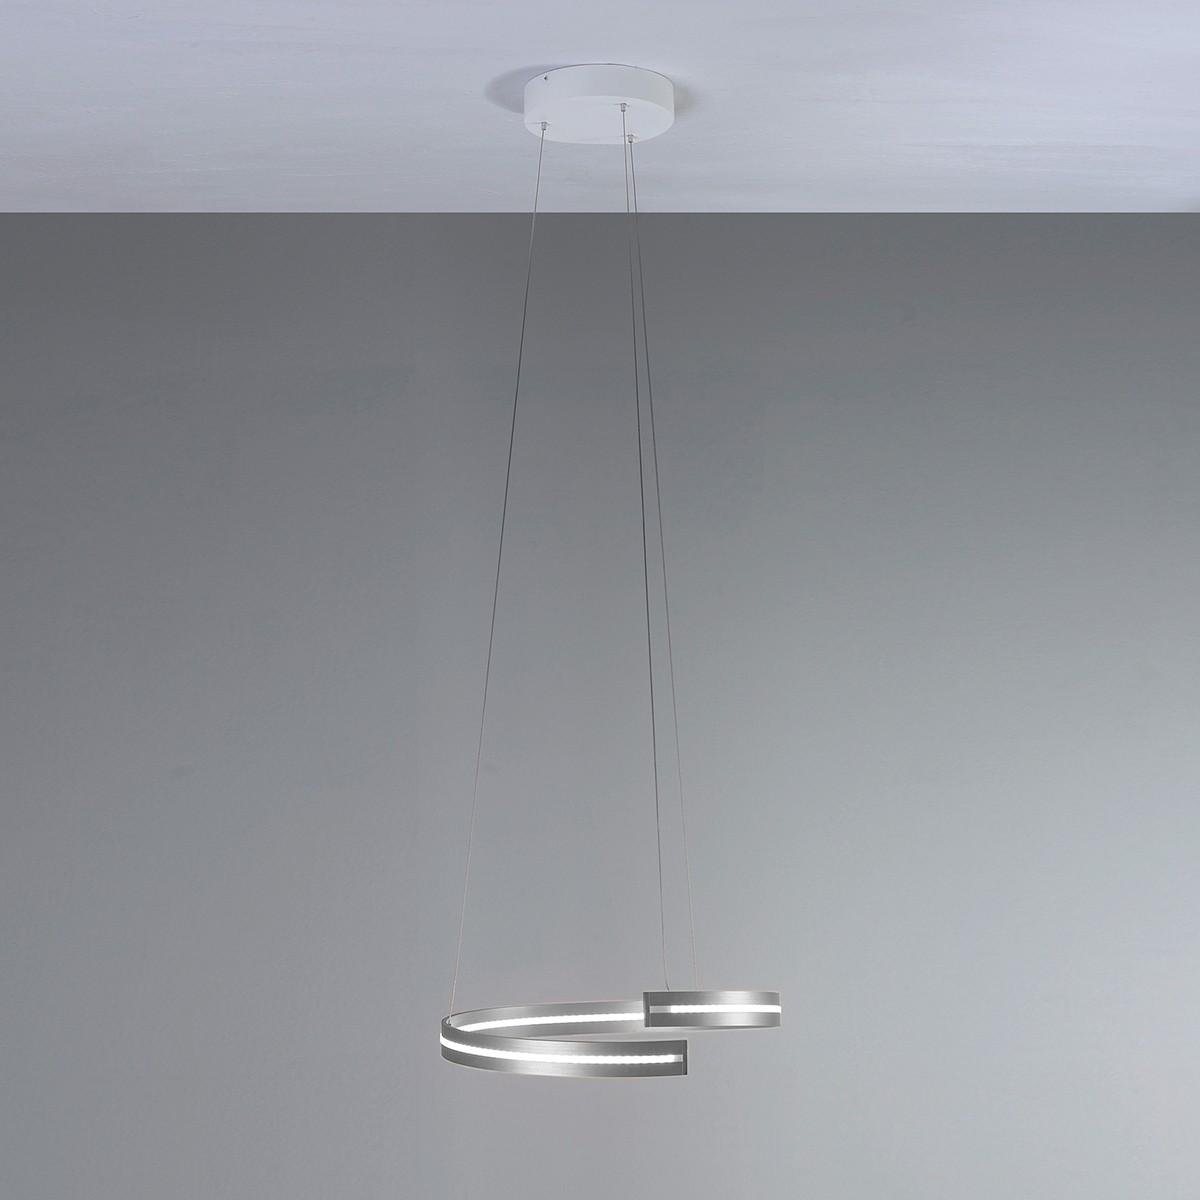 Bopp Break LED Pendelleuchte Ø: 40 cm, Aluminium geschliffen